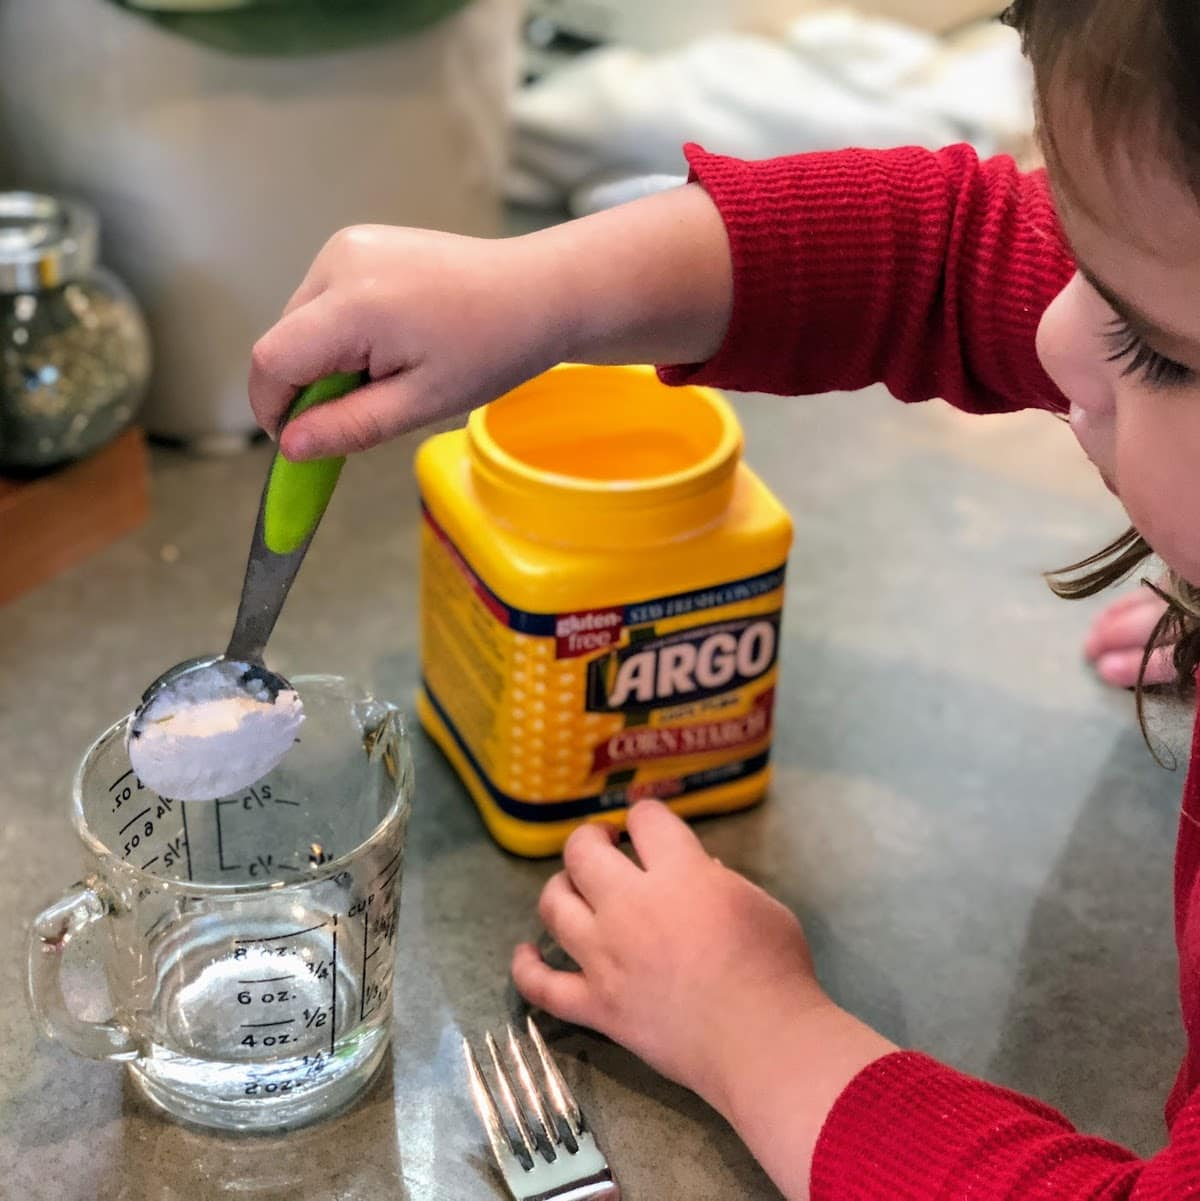 Child scooping up cornstarch